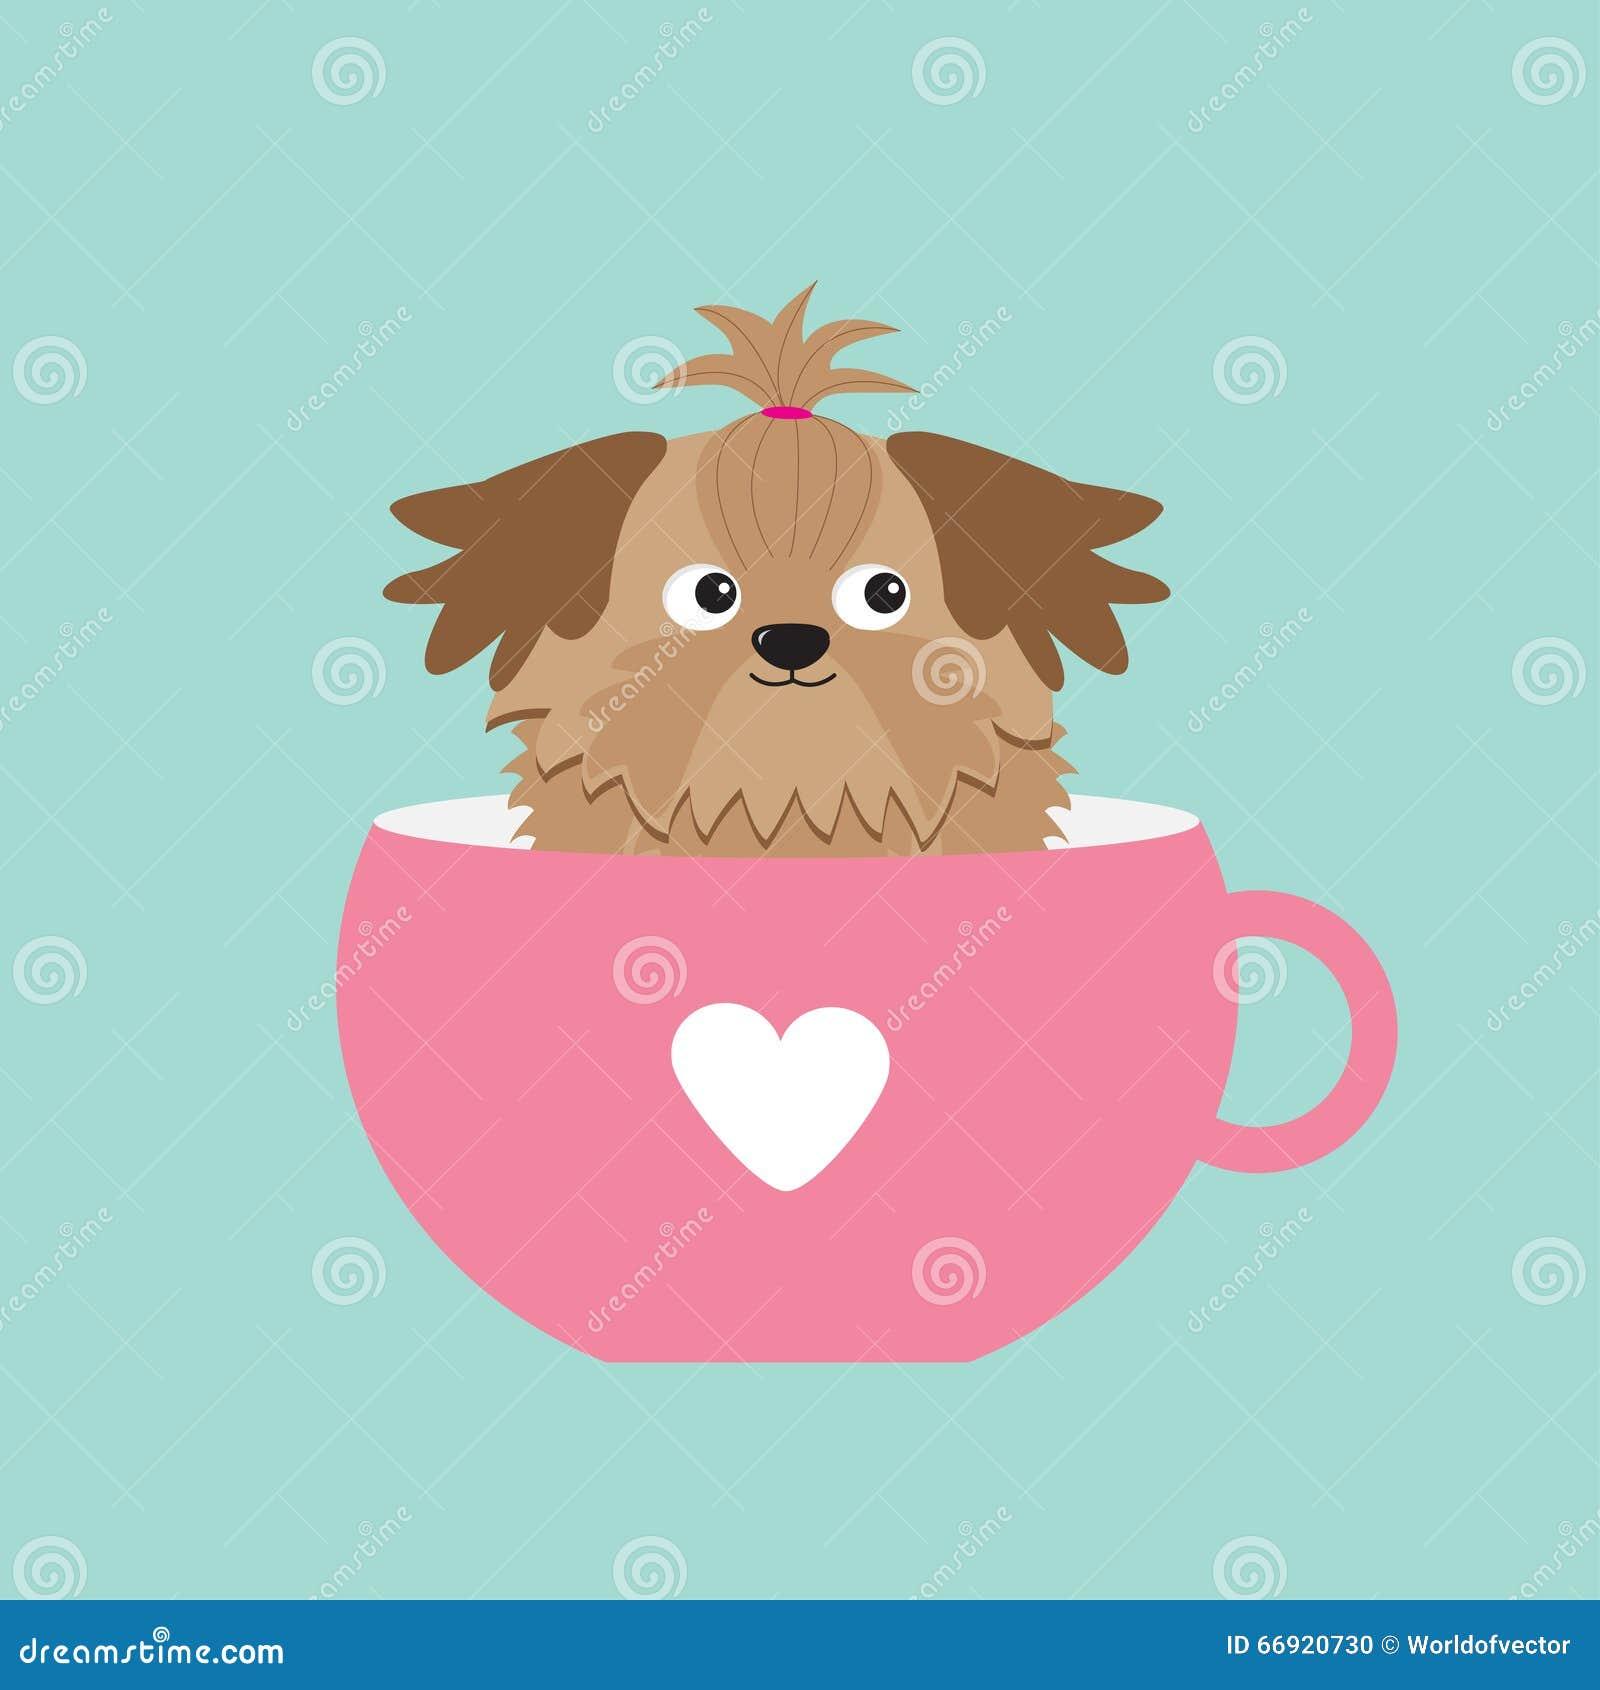 Cute Cartoon Character Design : Shih tzu dog sitting in pink cup with heart cute cartoon